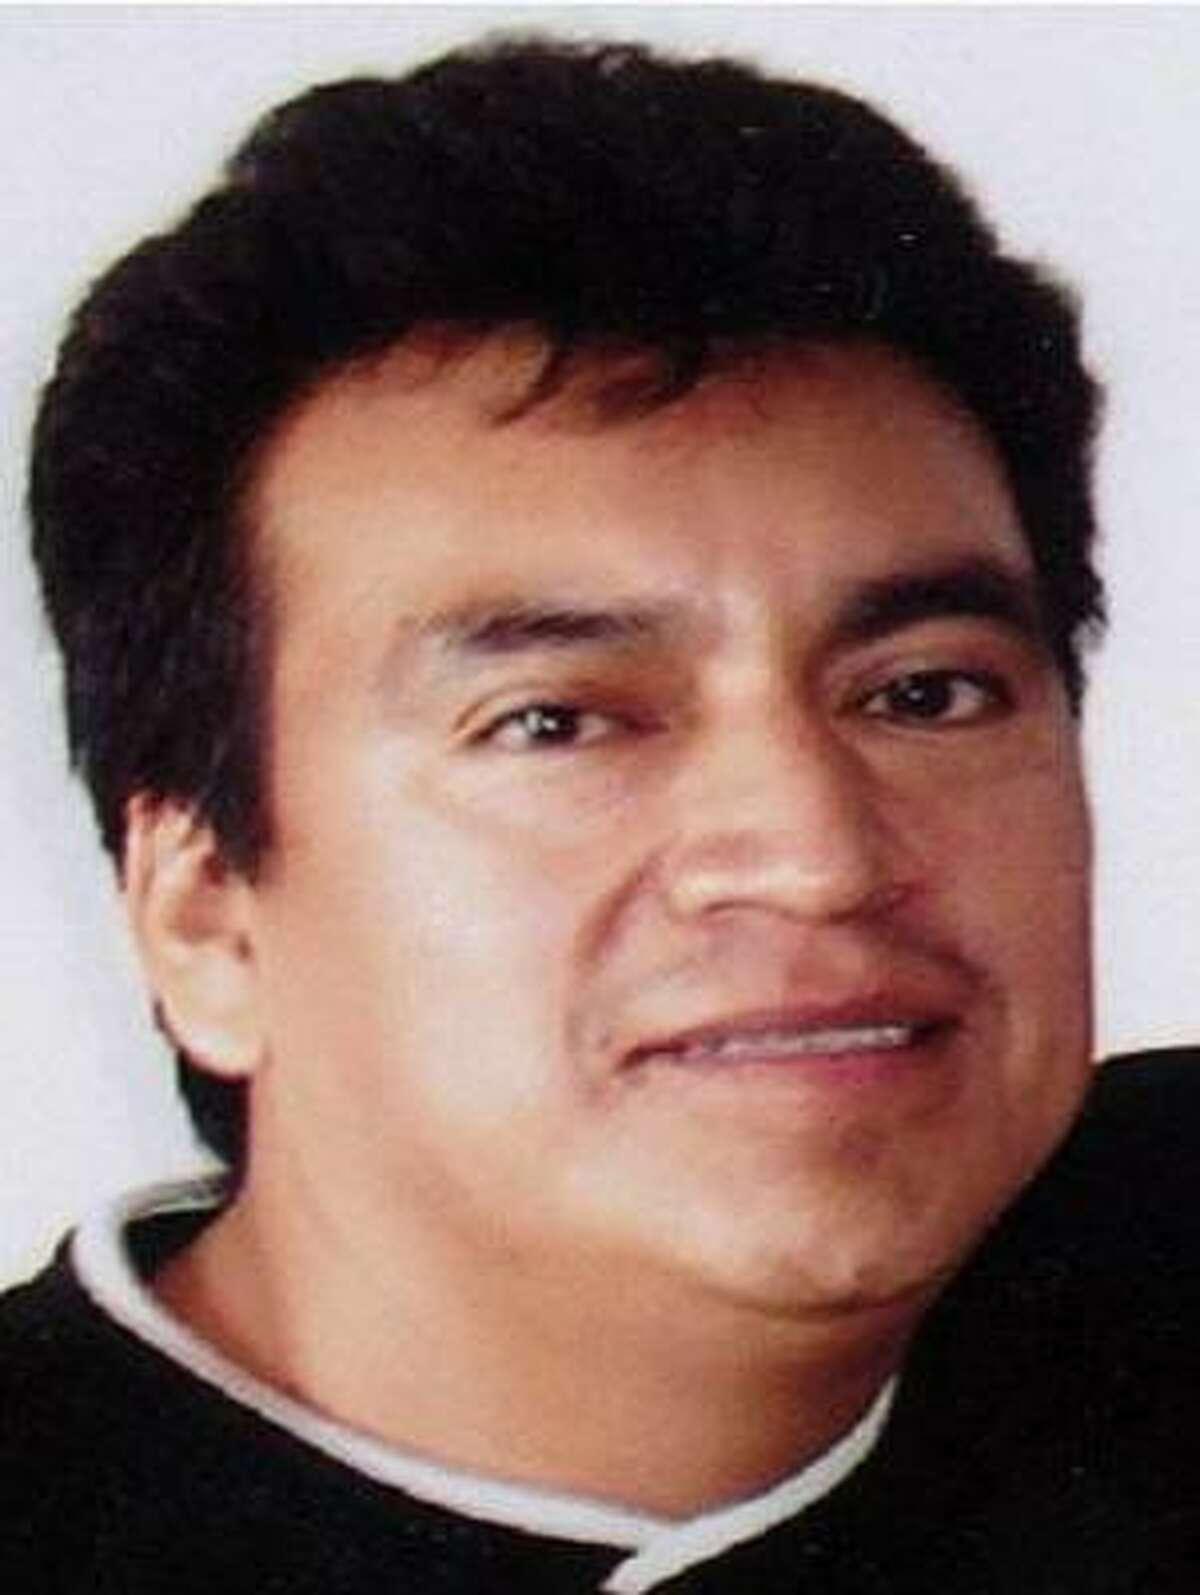 A federal indictment named Gerardo Salazar leader of an international human trafficking ring.